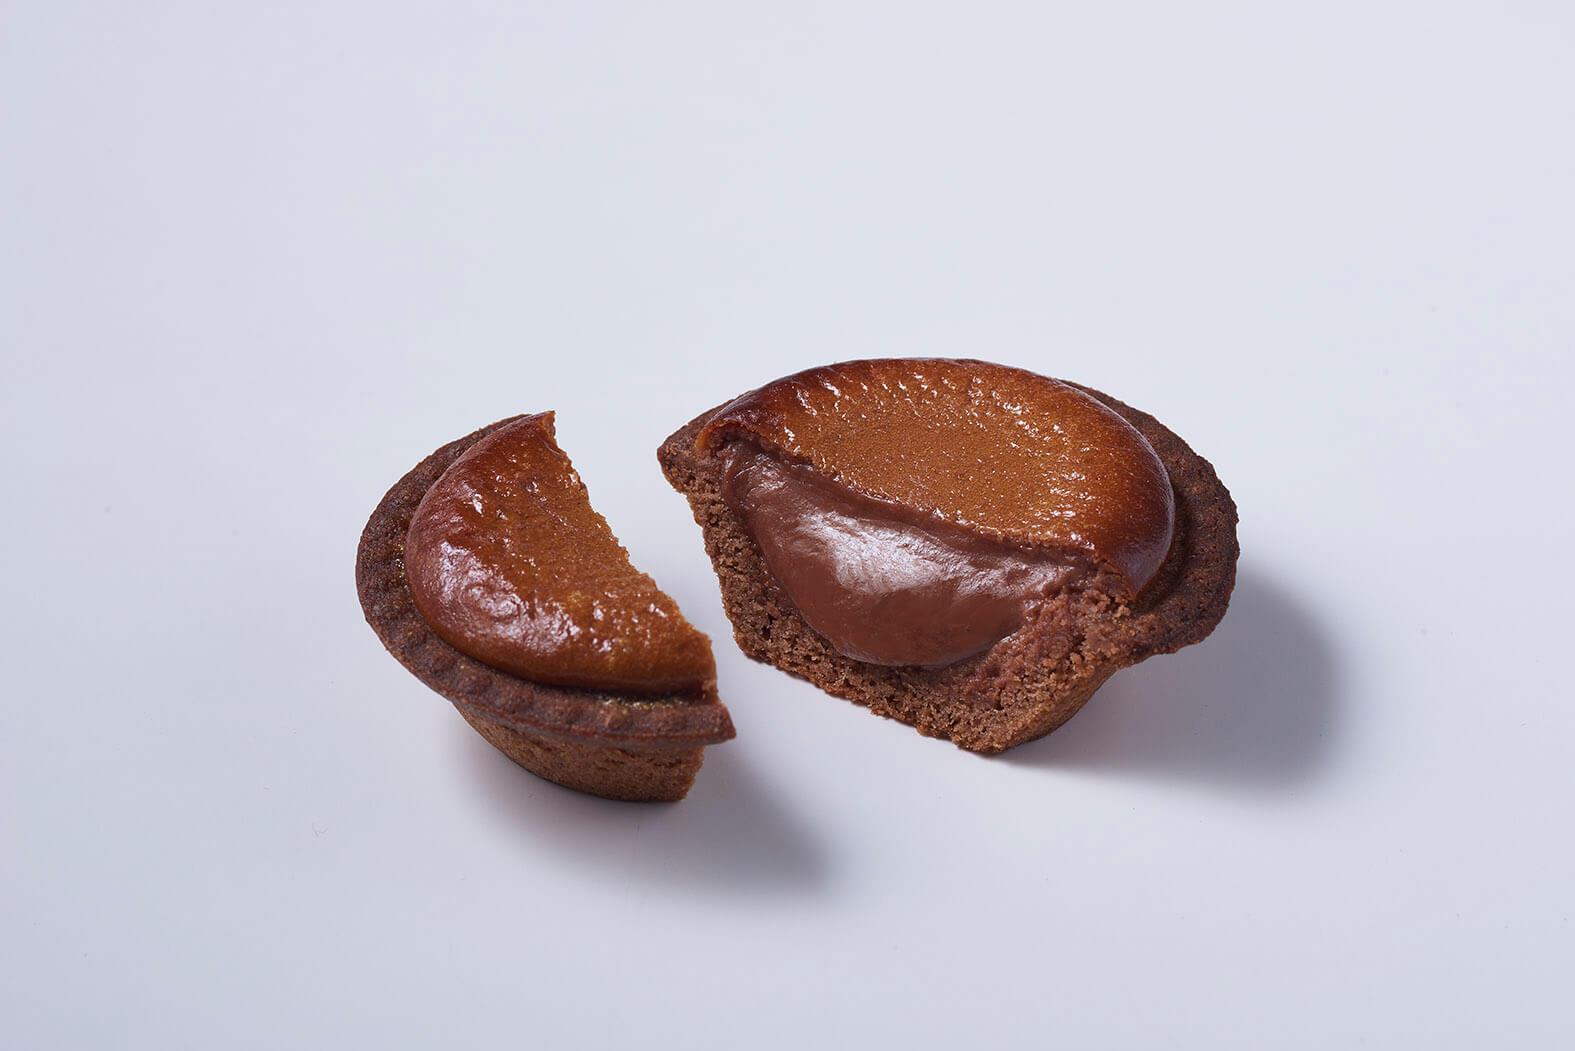 bake-cheese-tart-%e7%84%bc%e3%81%8d%e3%81%9f%e3%81%a6%e3%83%81%e3%83%a7%e3%82%b3%e3%83%ac%e3%83%bc%e3%83%88%e3%83%81%e3%83%bc%e3%82%b9%e3%82%99%e3%82%bf%e3%83%ab%e3%83%88-9-2